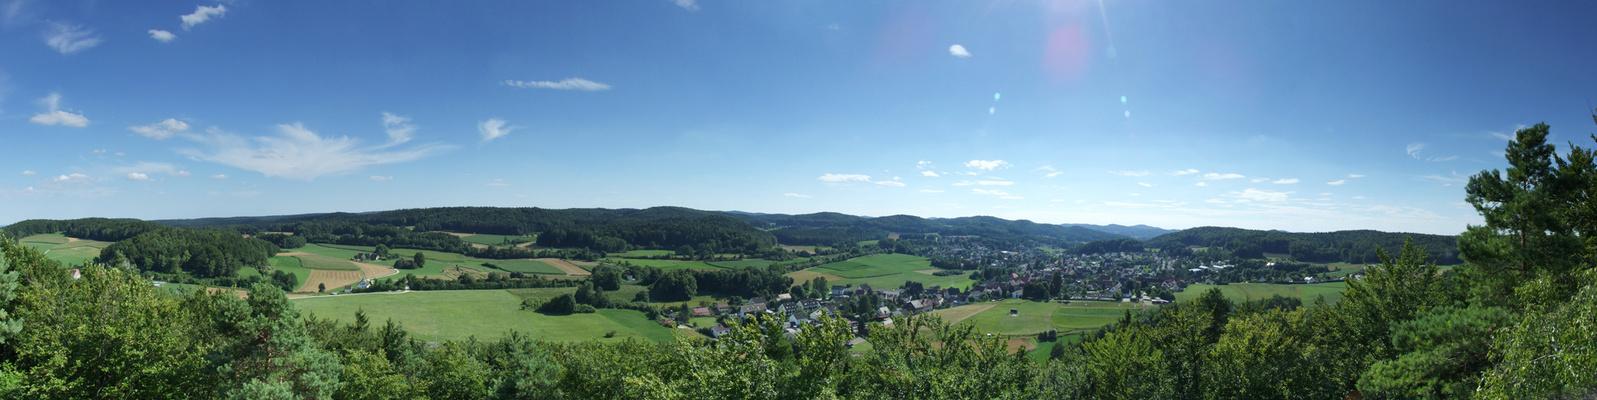 Neukirchen bei Sulzbach- Rosenberg